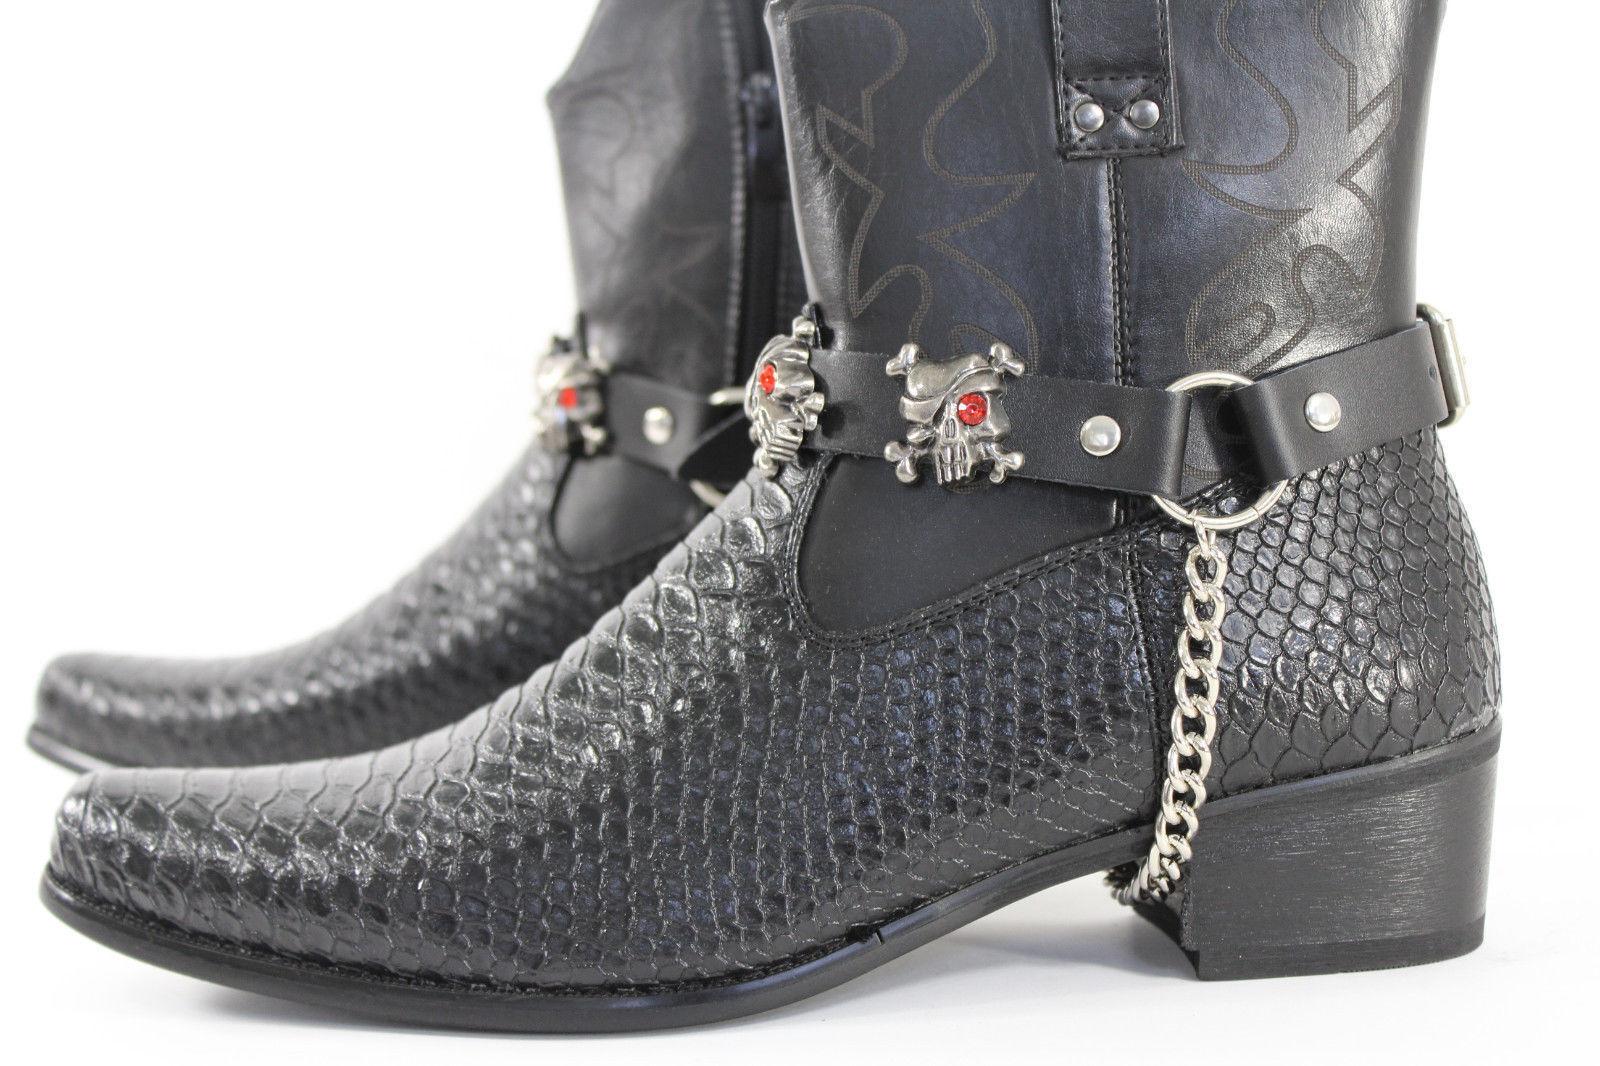 Biker Western Boots Bracelets Chain Black Leather 2 Straps Silver Skull Skeleton